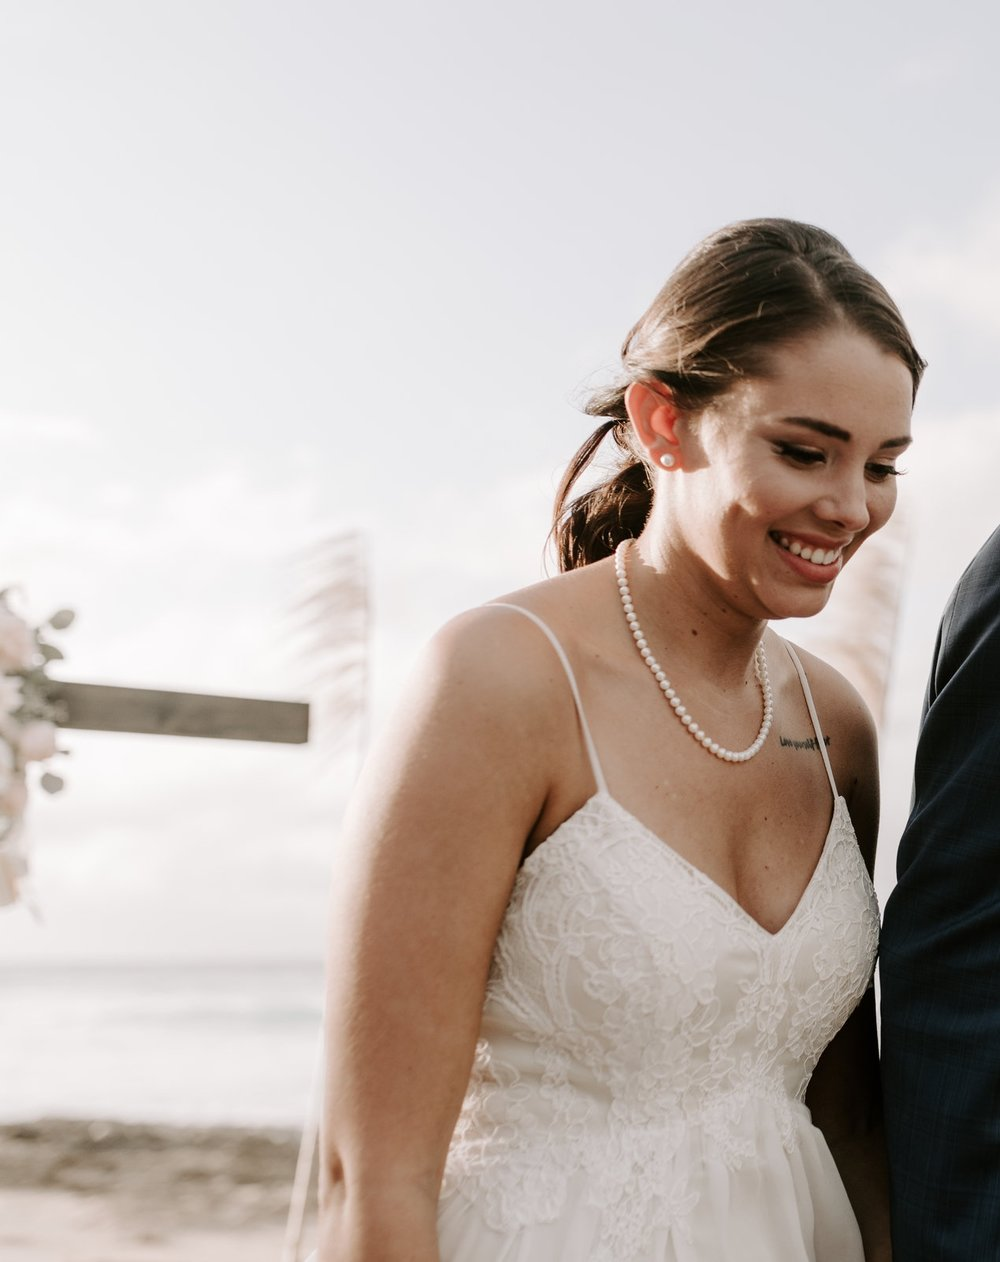 Meet the Bride - Emily